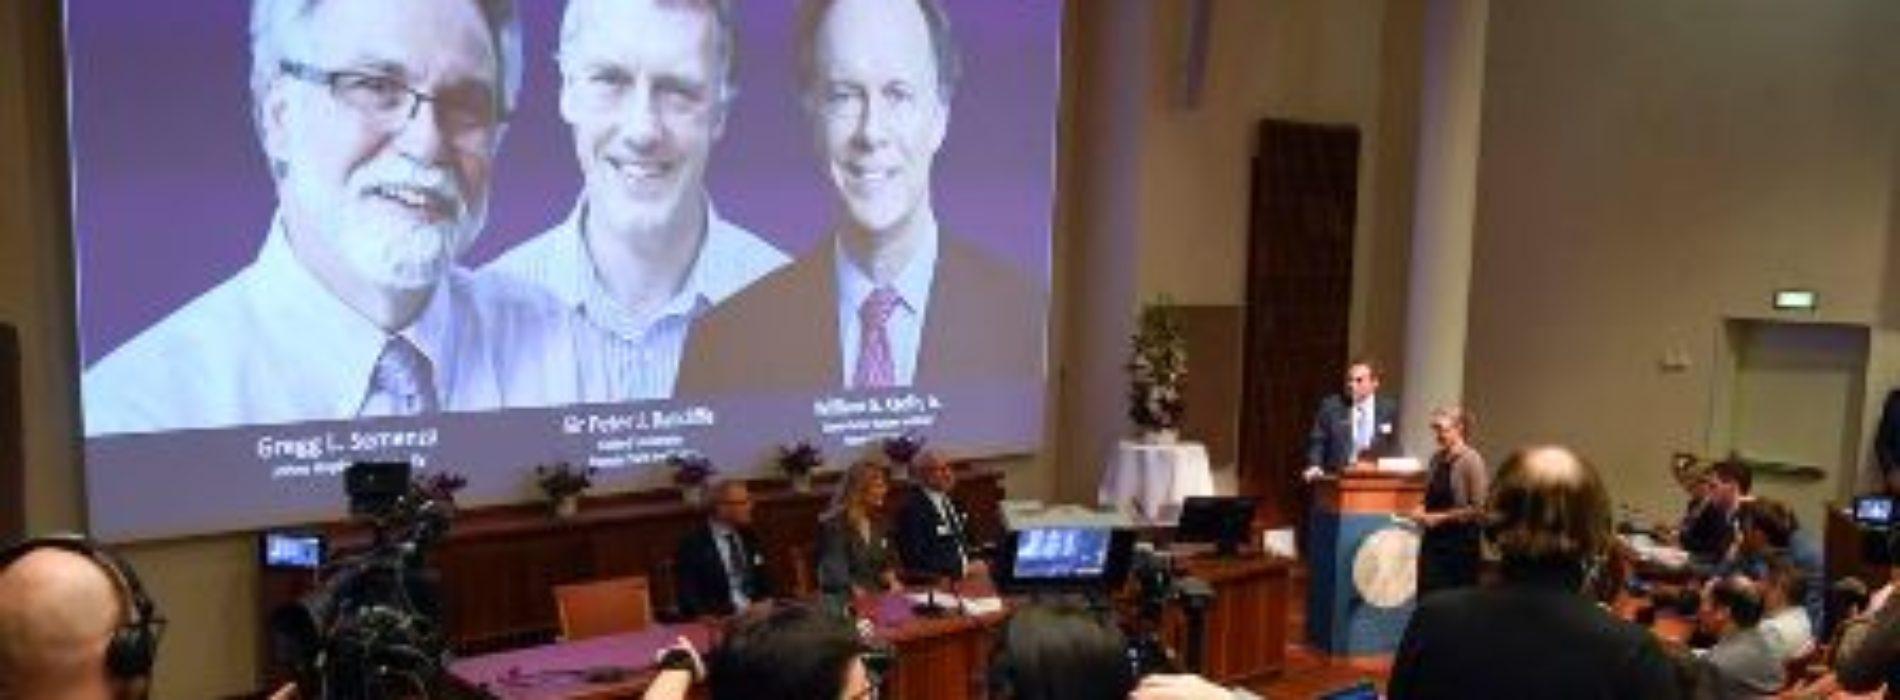 2 Americans, British scientists win 2019 Nobel prize for medicine